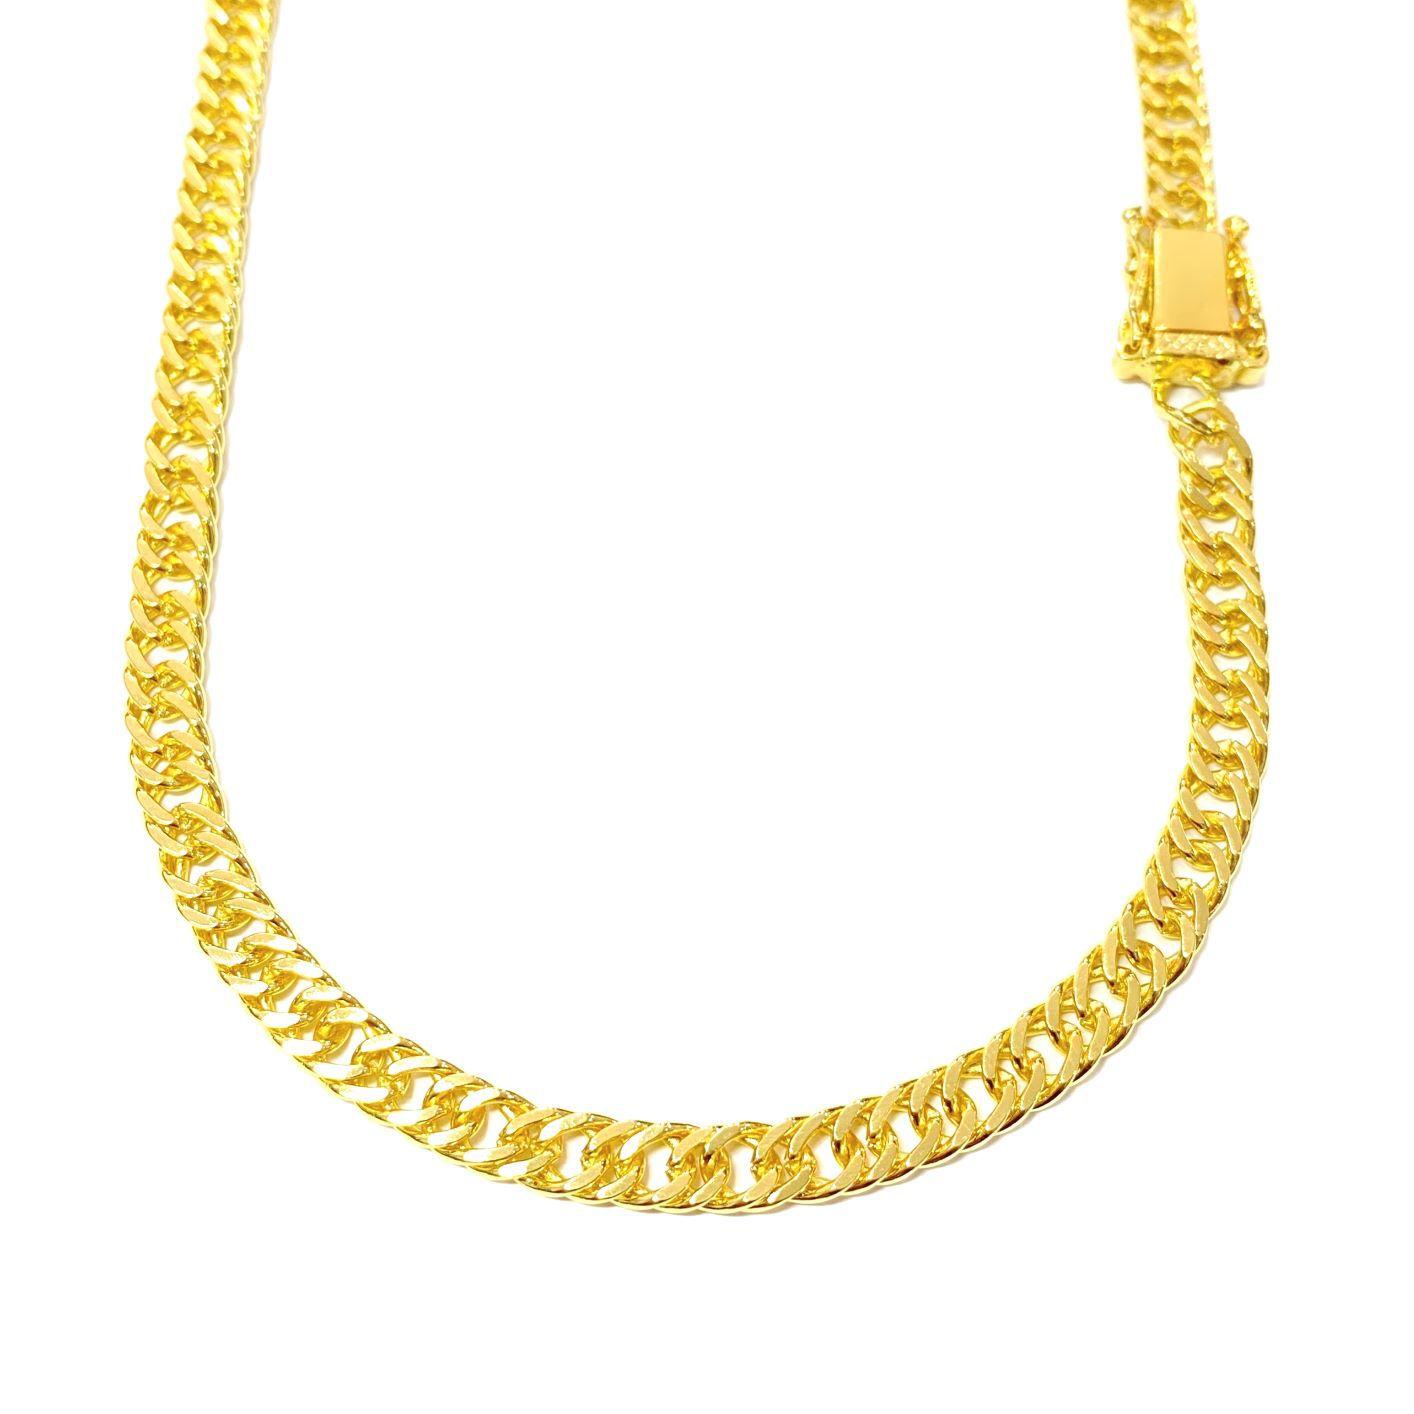 kit Corrente Double Grumet Diamantada 5,5mm 60cm 28g (Fecho Gaveta Dupla) + Pingente Medusa Octa 6,5g 2,7cm x 2,7cm (Banho Ouro 24k)Pingente Medusa Octa 6,5g 2,7cm x 2,7cm (Banho Ouro 24k)